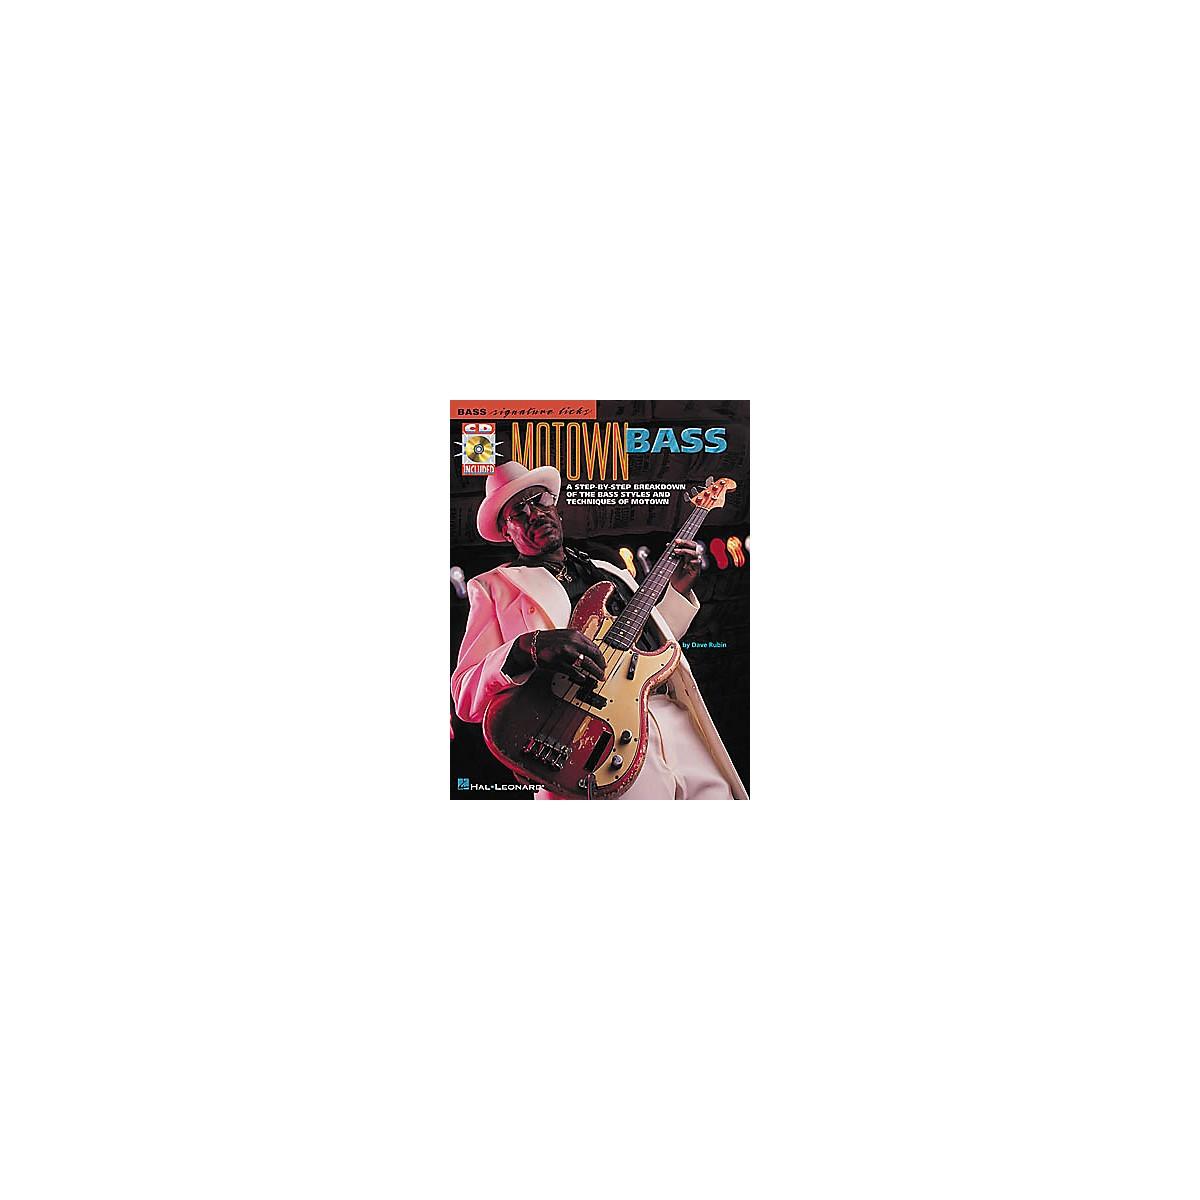 Hal Leonard Motown Bass Signature Licks Book with CD